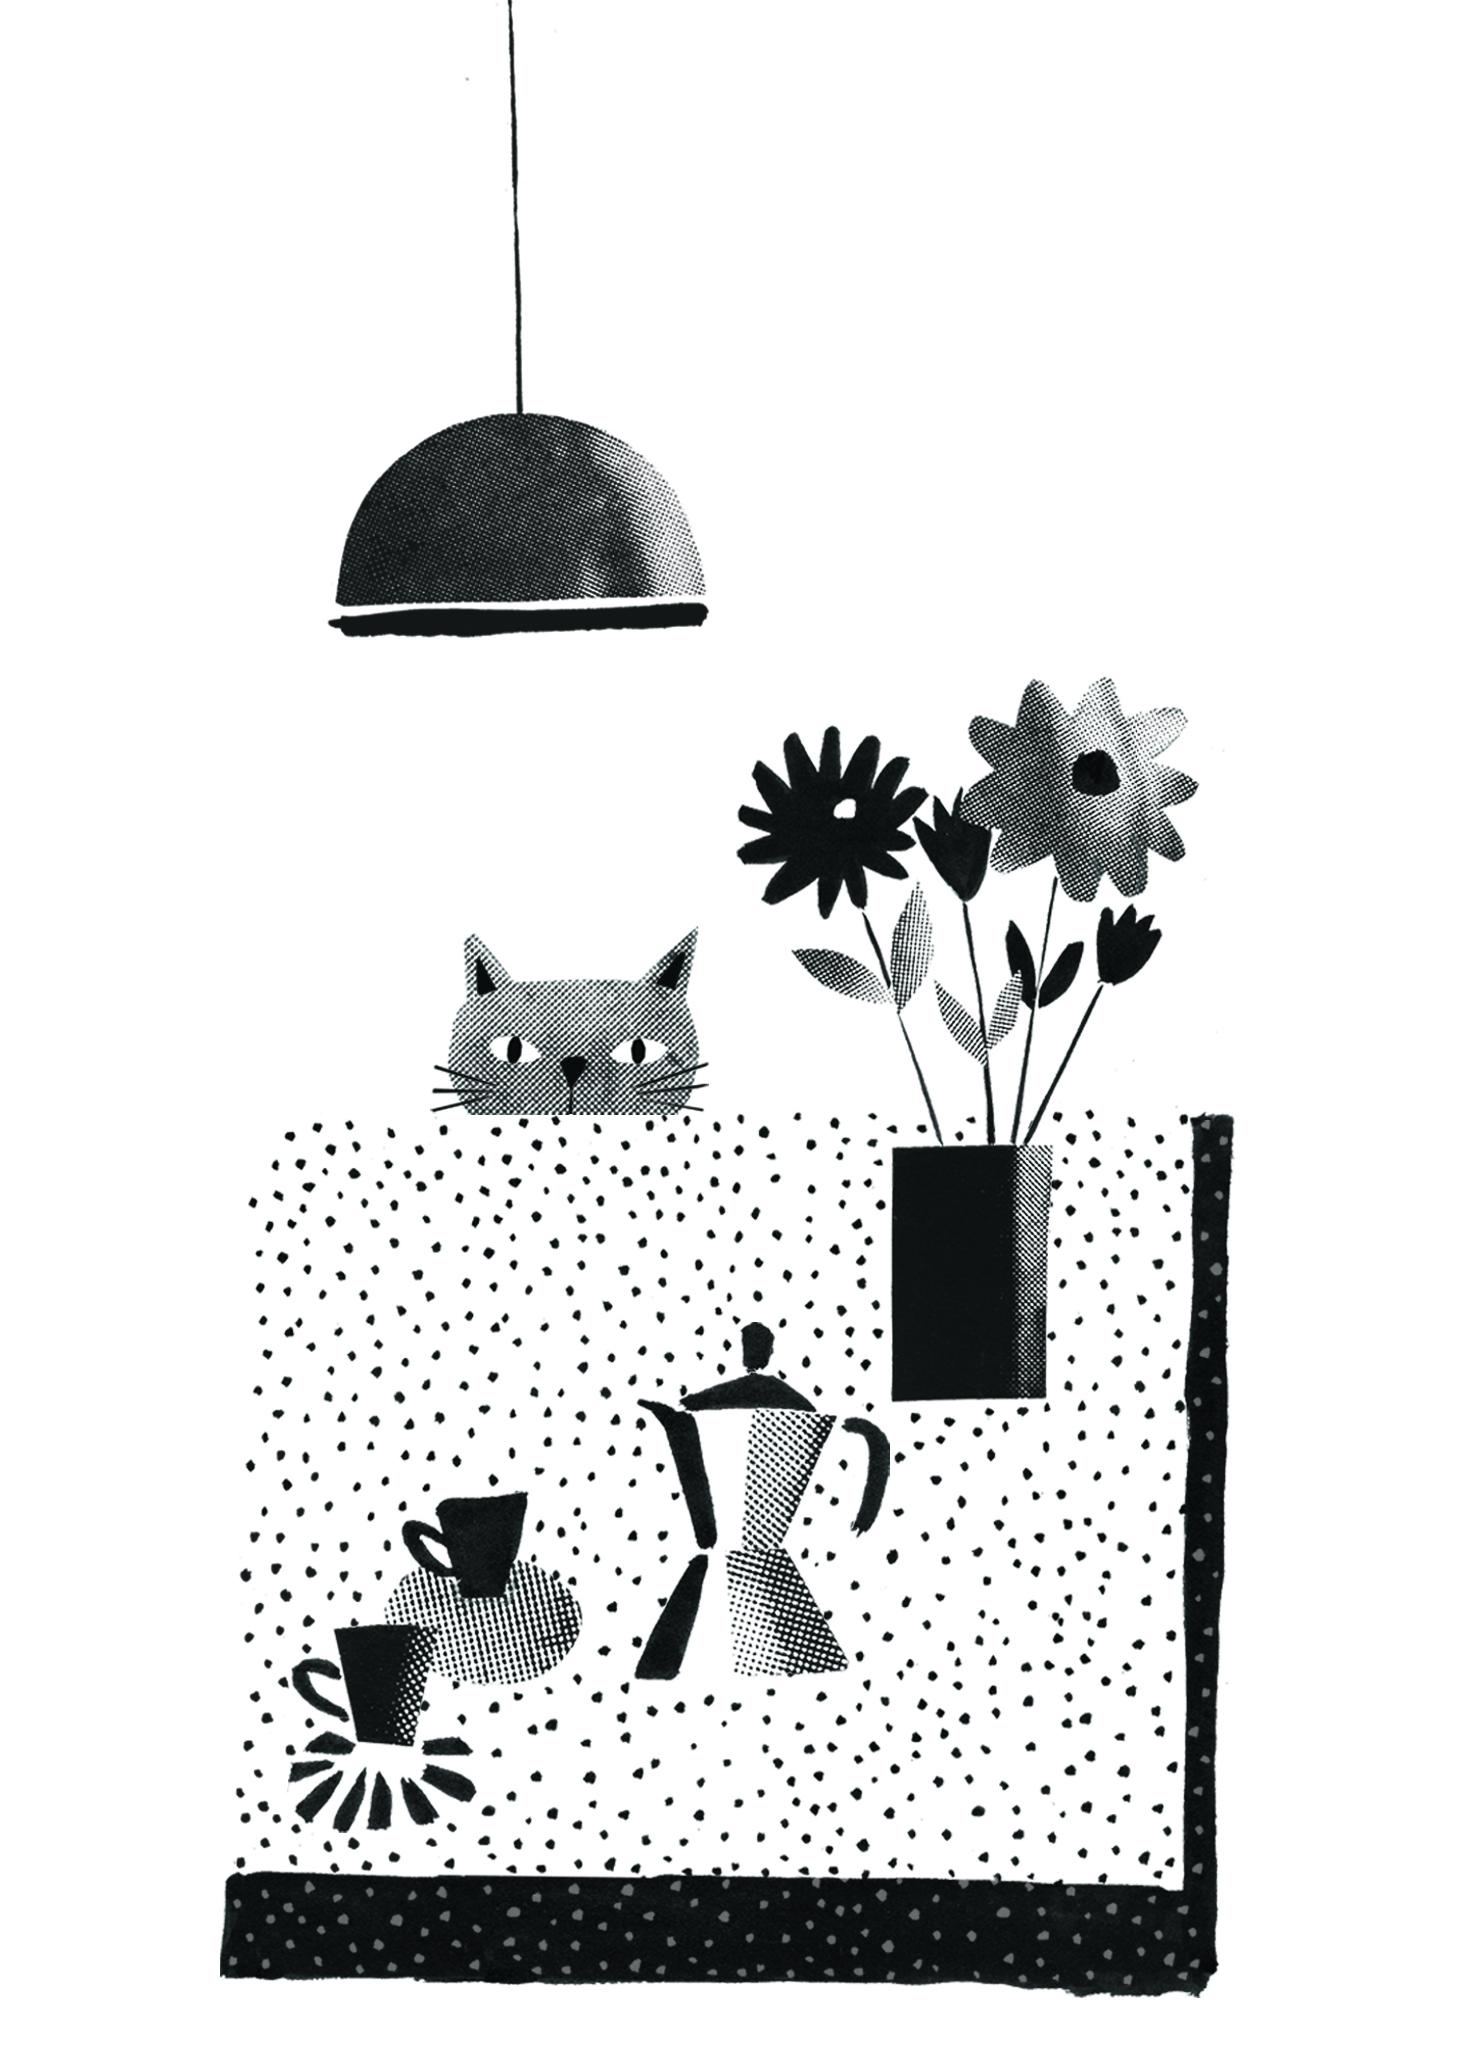 07.cat card.jpg